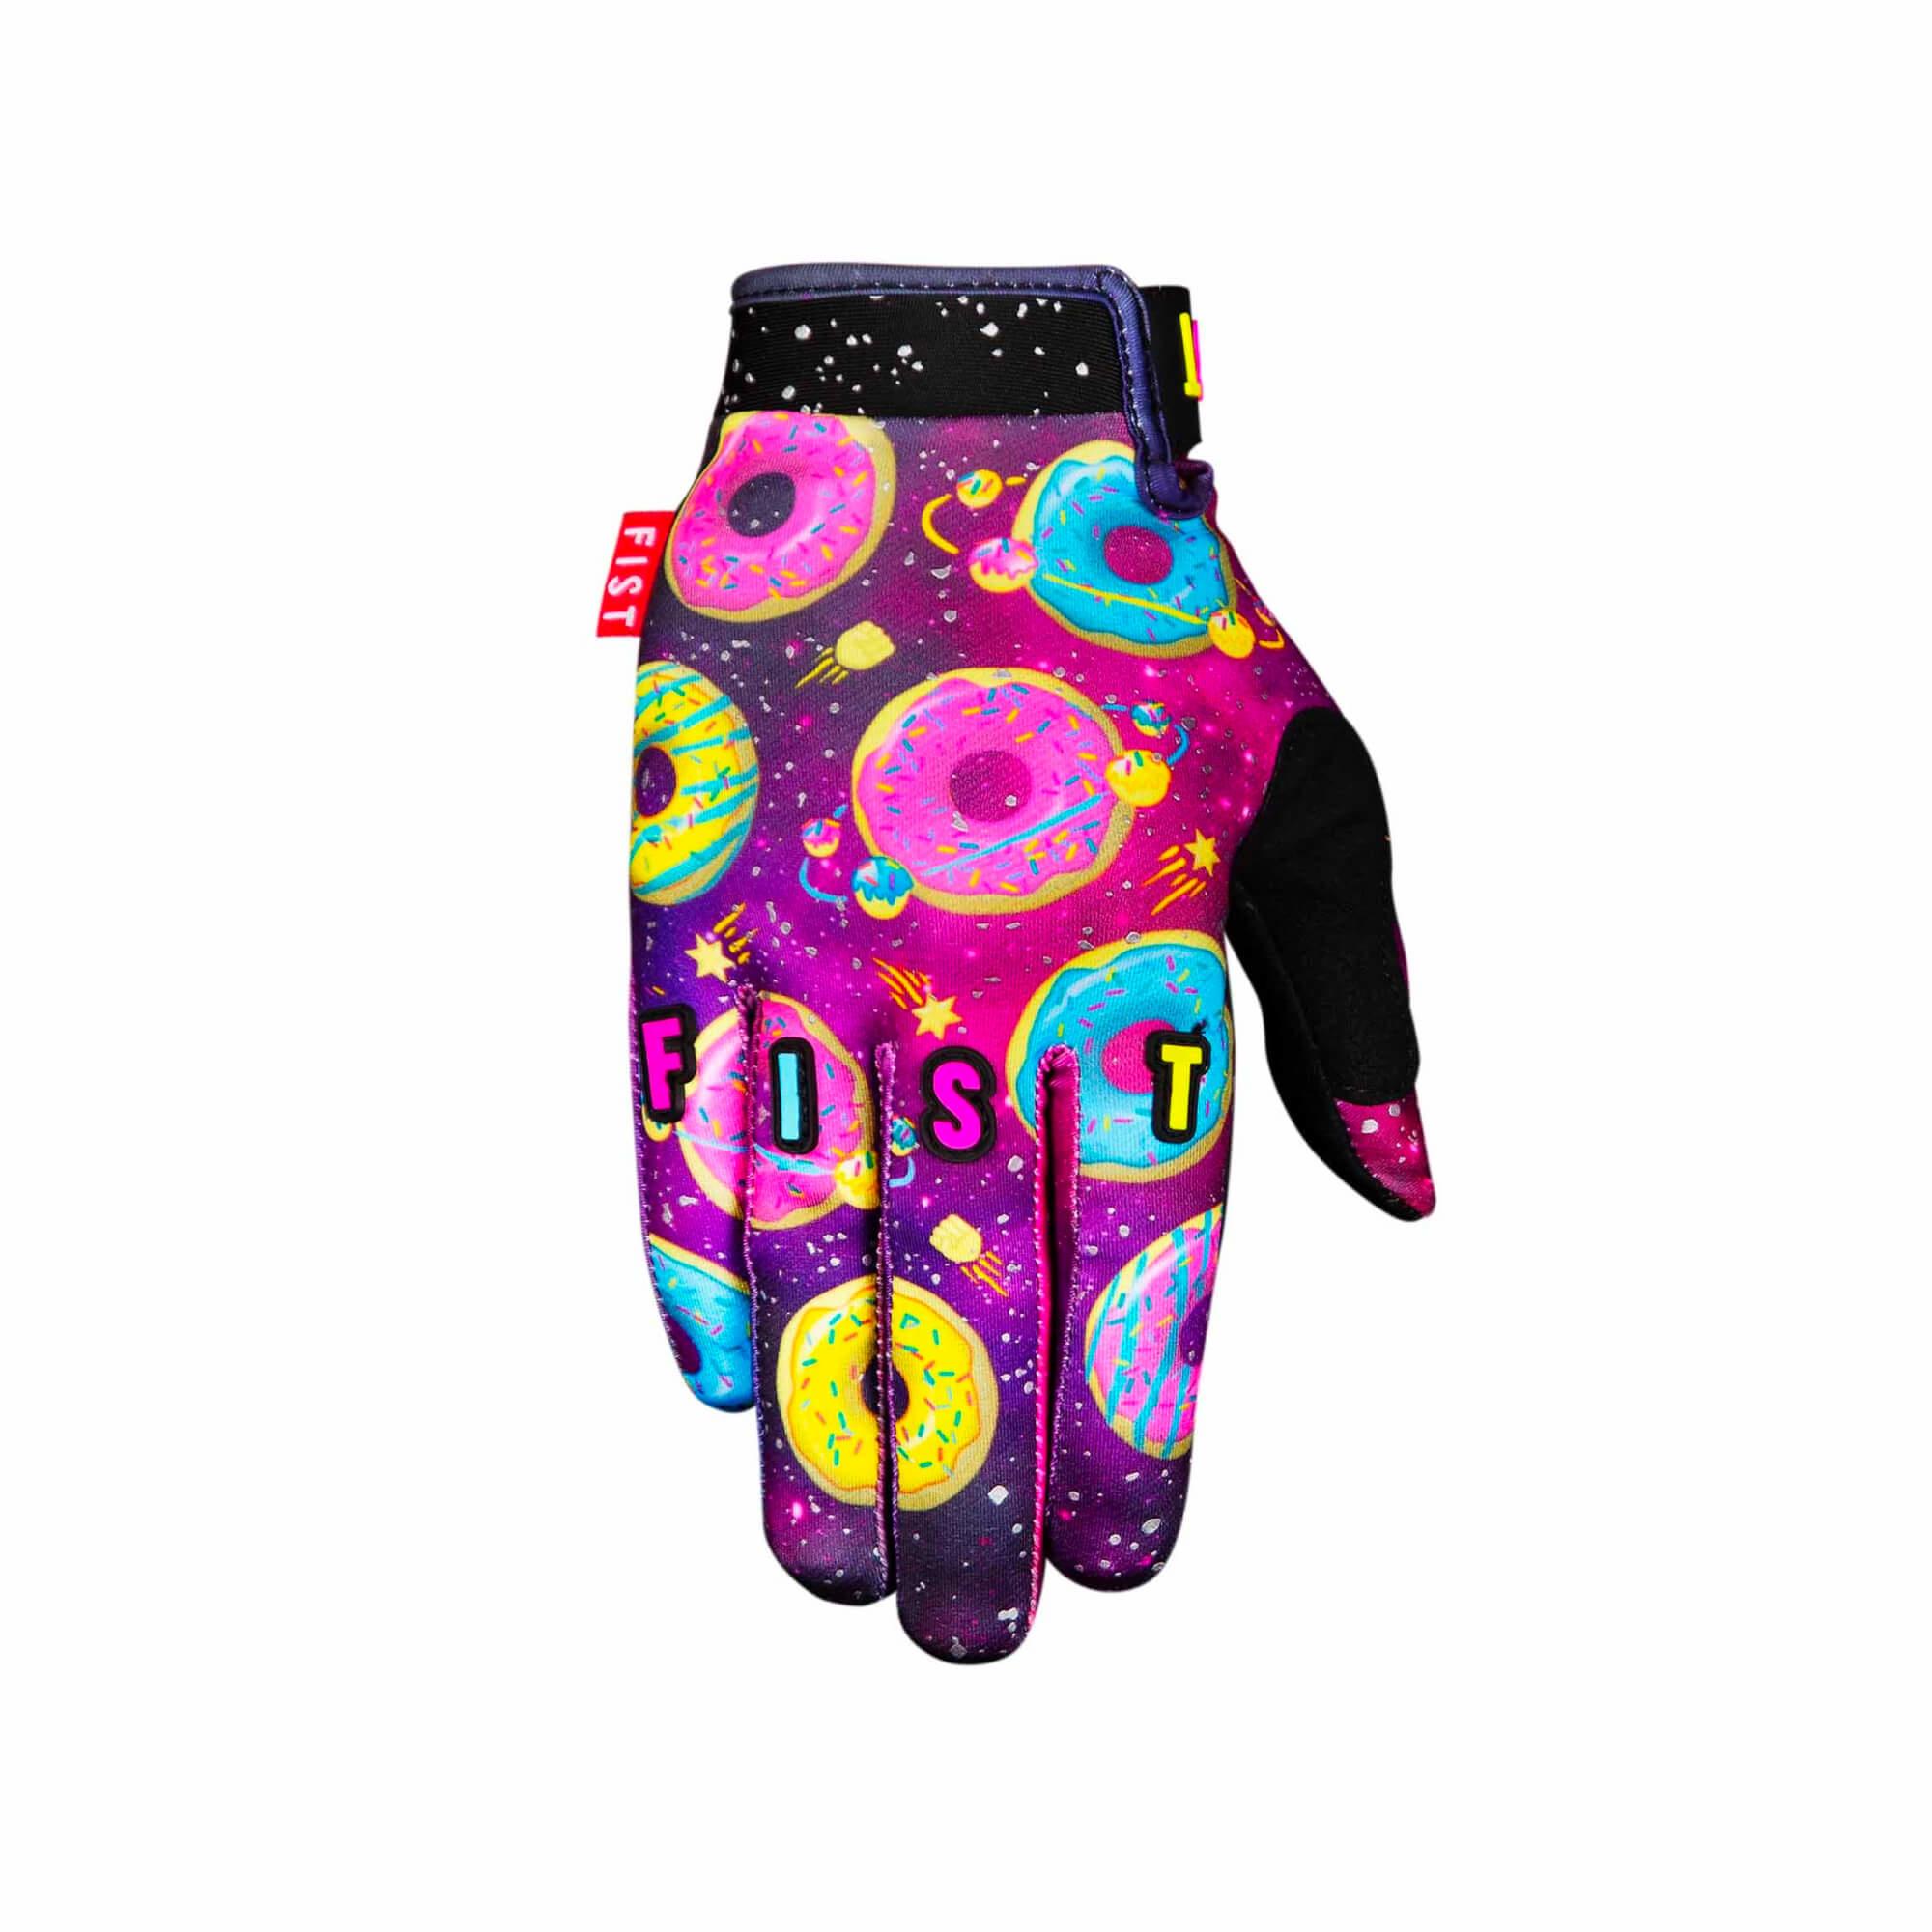 Caroline Buchanan Gloves - Sprinkles 3-1